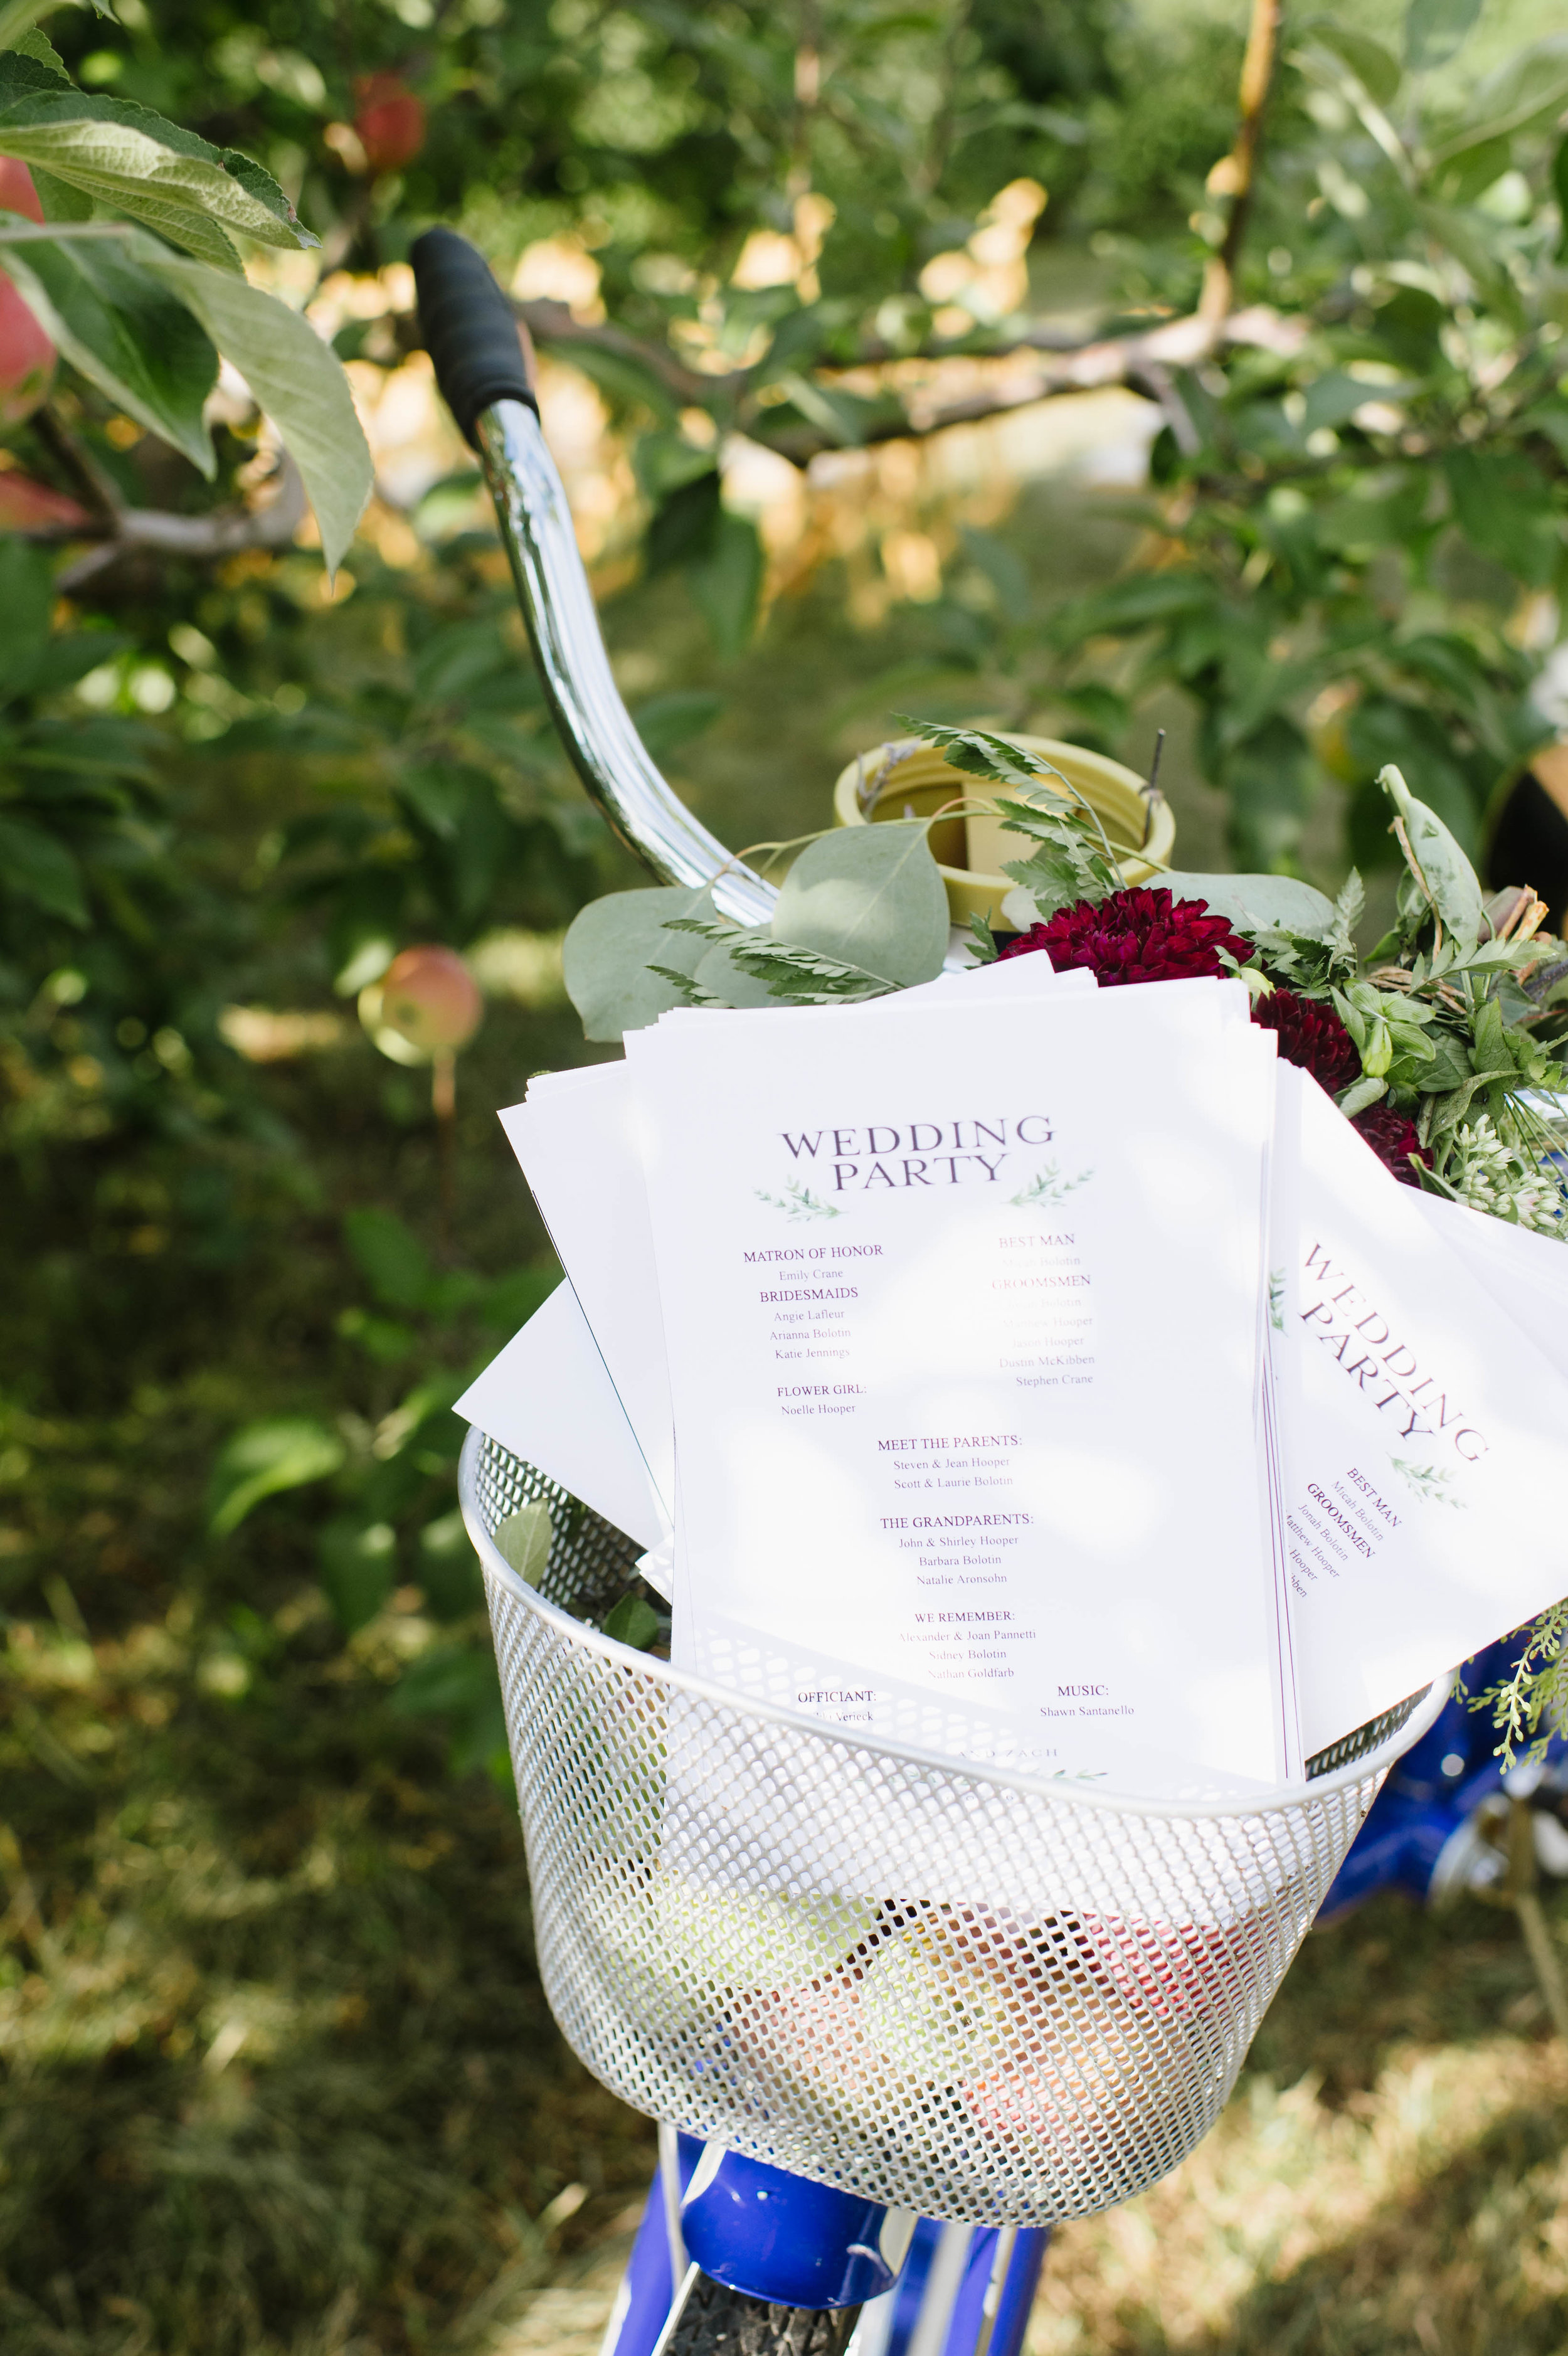 Candid-Wedding-Photography-Boston012.jpg